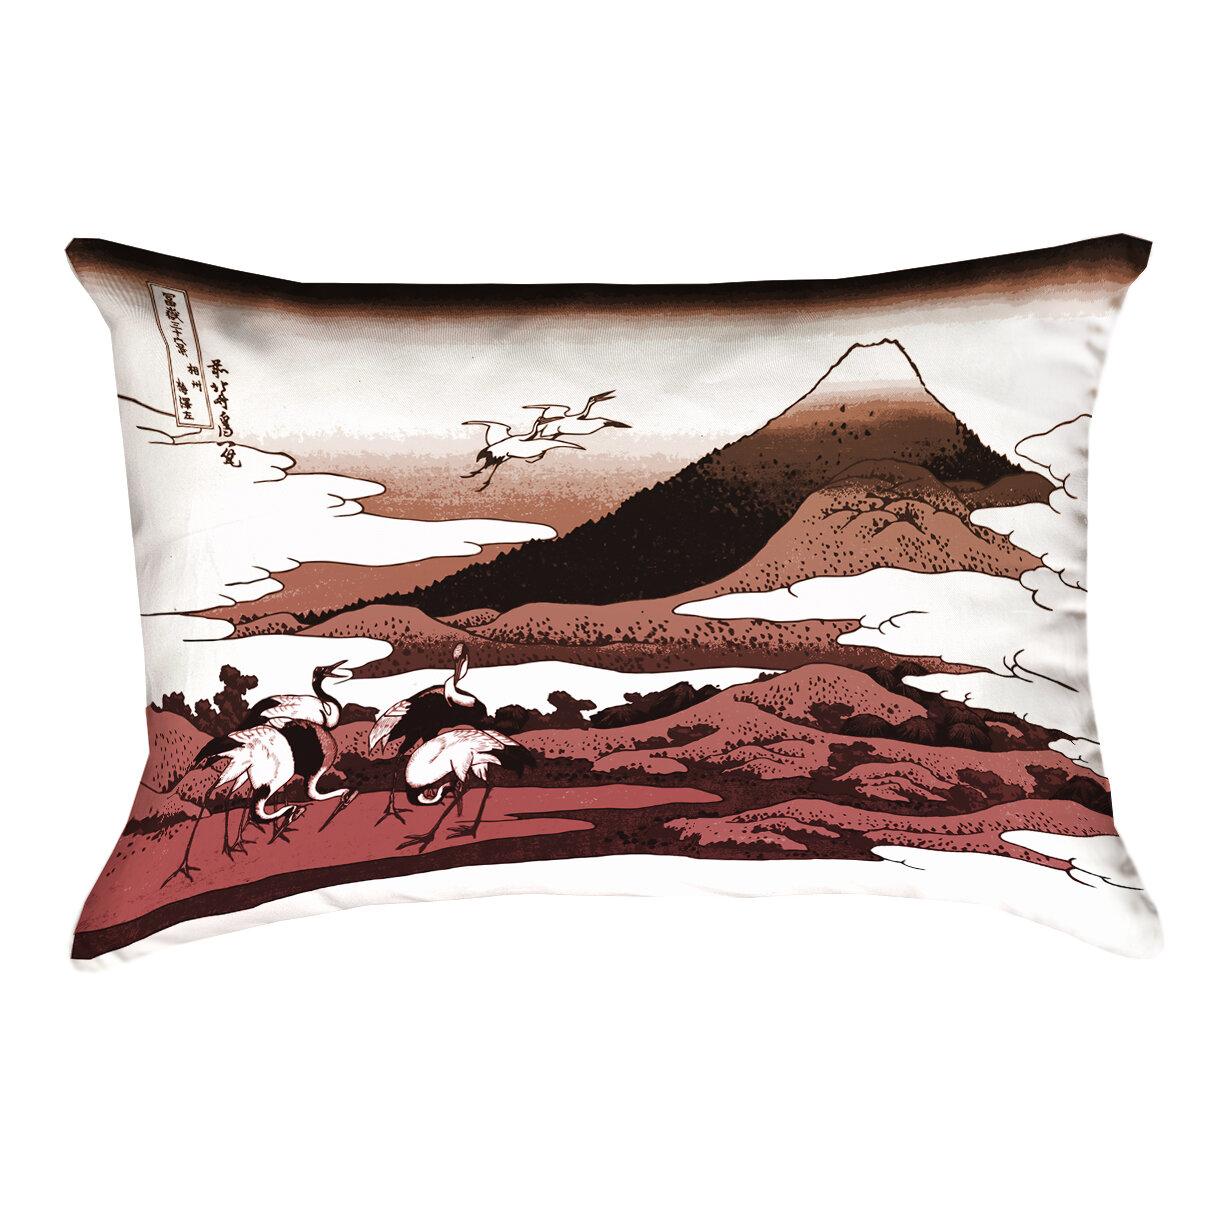 Bloomsbury Market Montreal Japanese Cranes Outdoor Lumbar Pillow Wayfair